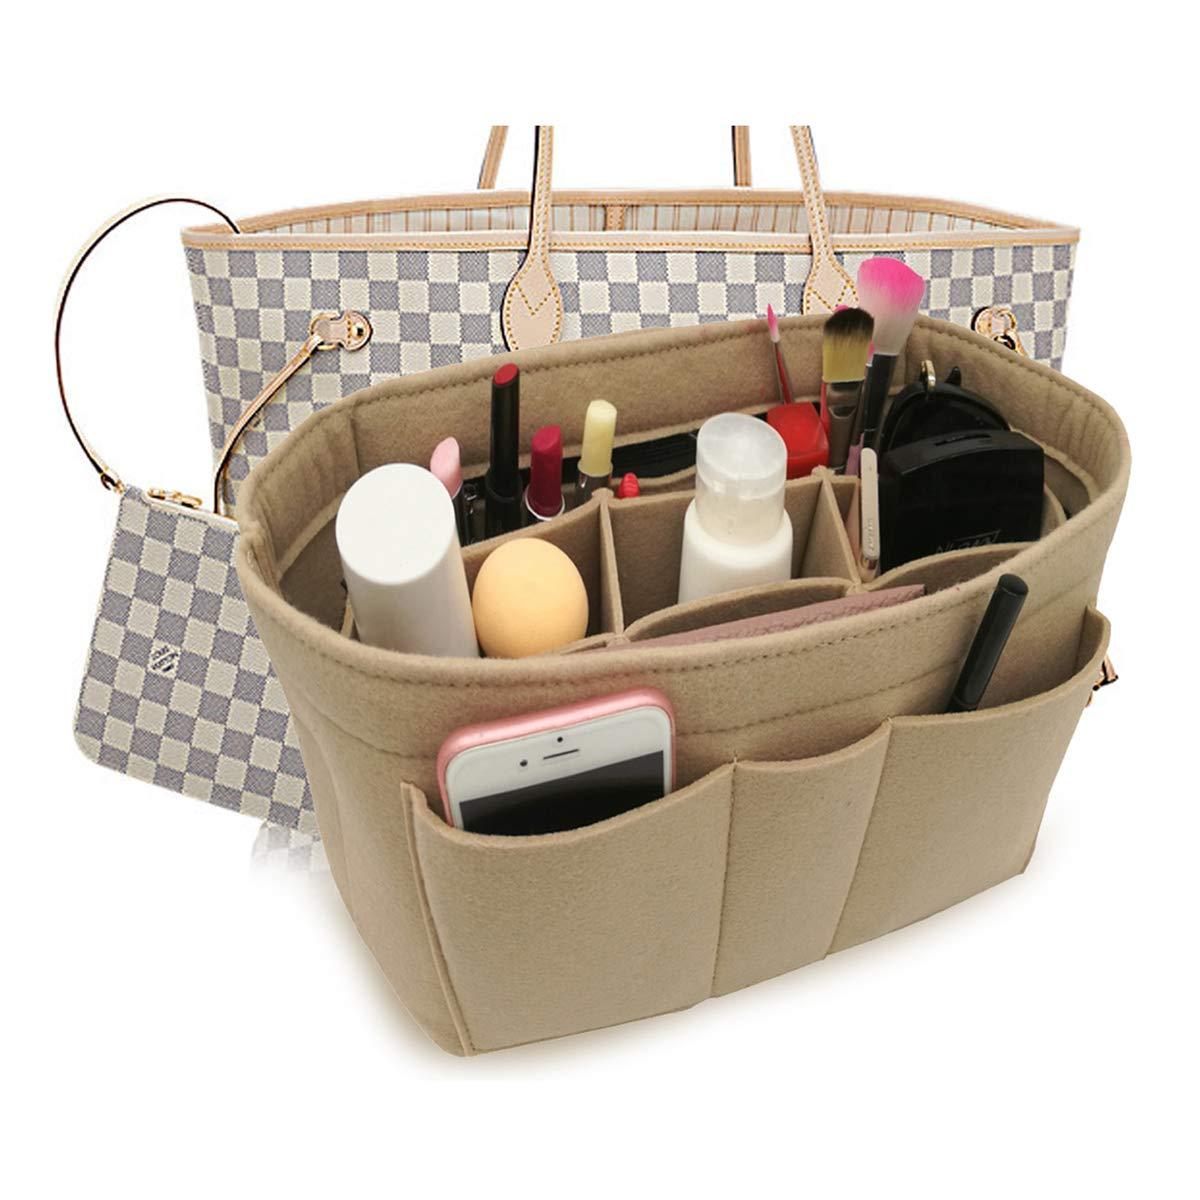 Felt Insert Fabric Purse Organizer Bag, Bag Insert In Bag with Zipper Inner Pocket Fits Neverfull Speedy 8010 Beige L